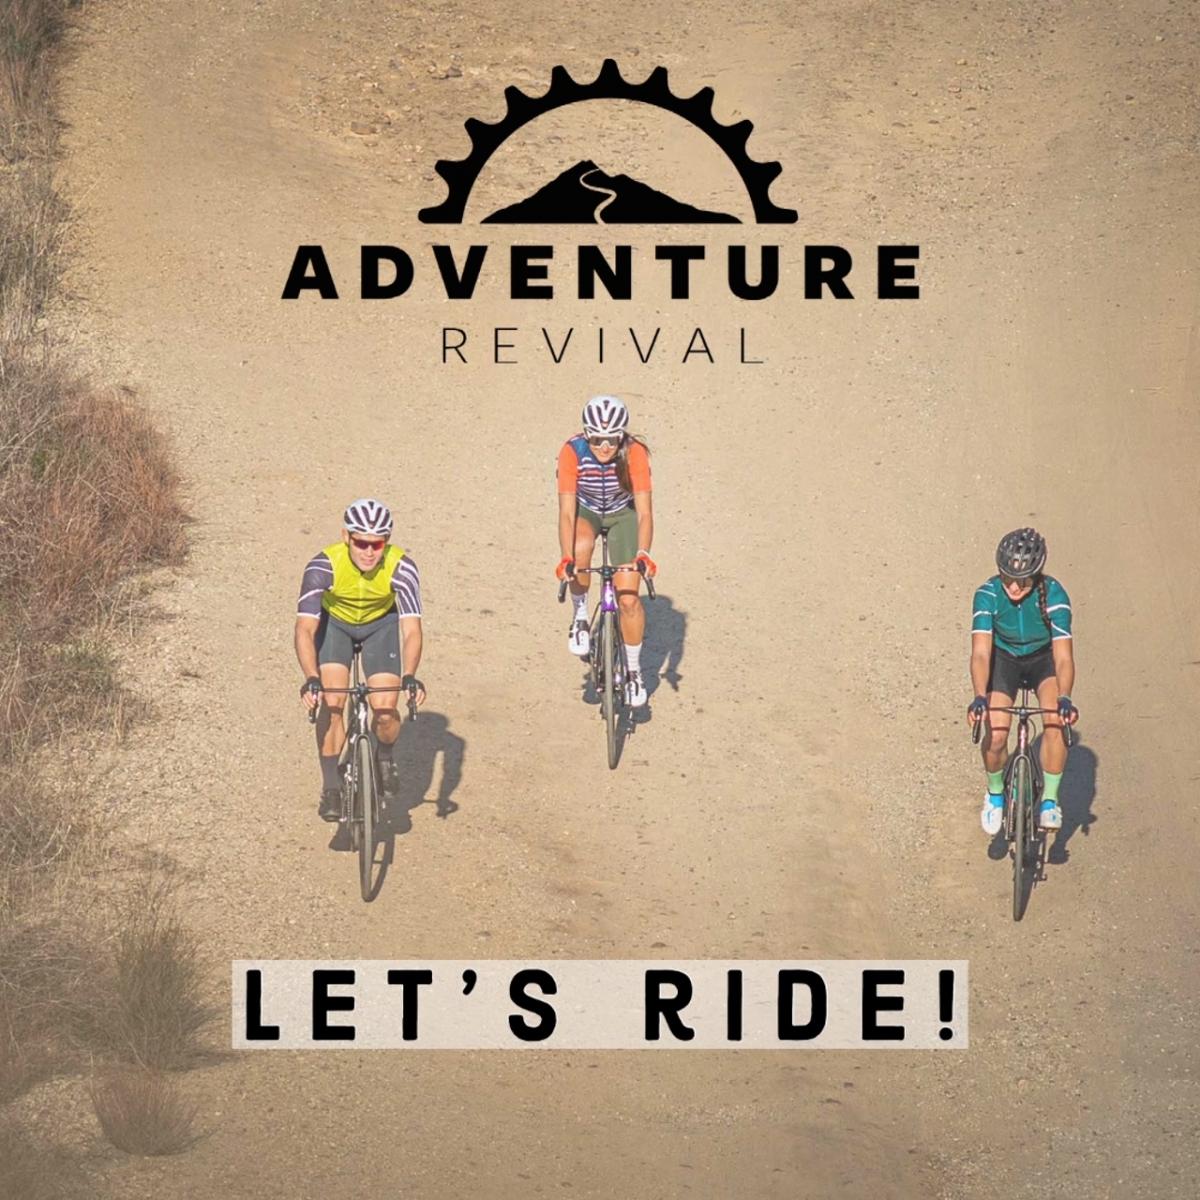 Adventure Revival